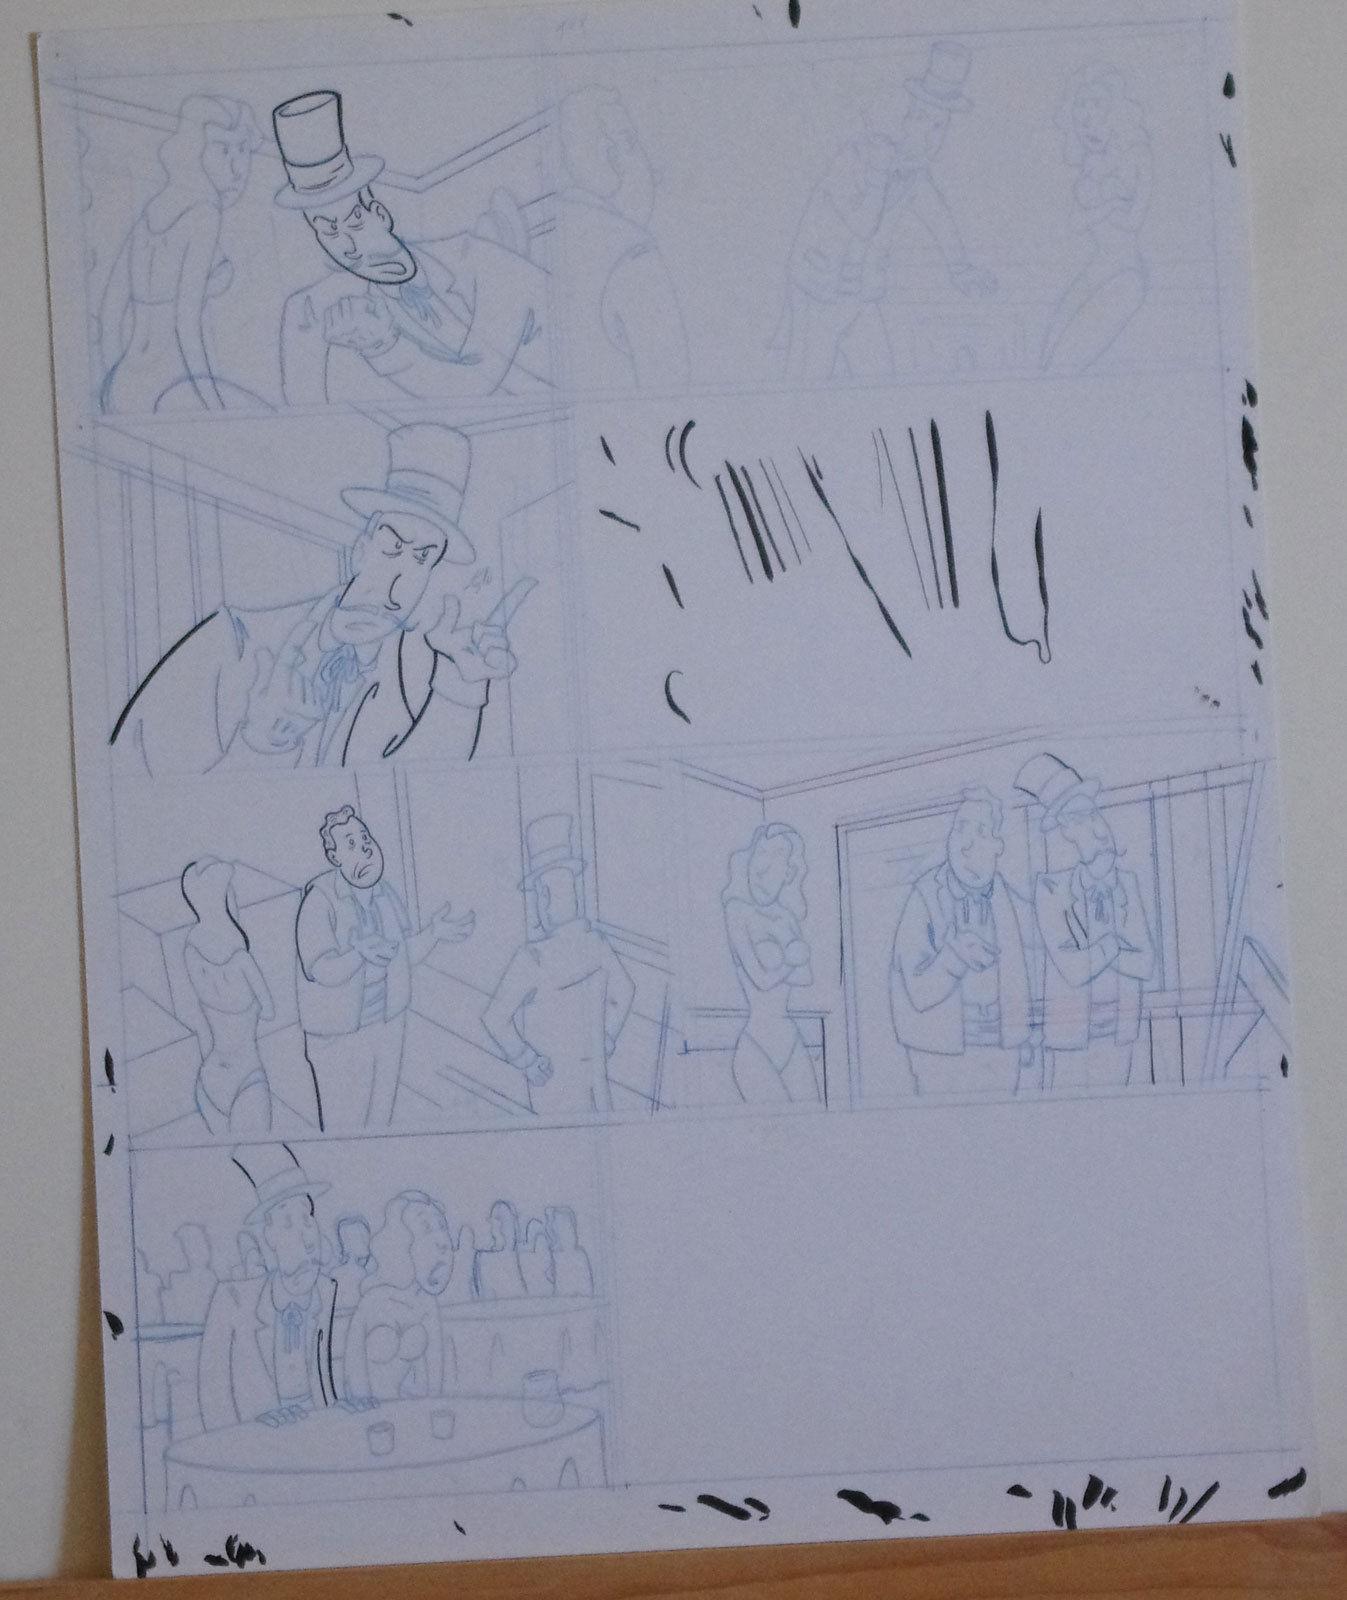 DOUGLAS PASZKIEWICZ original art, ARSENIC LULLABY BIG STALL pg 11, 11